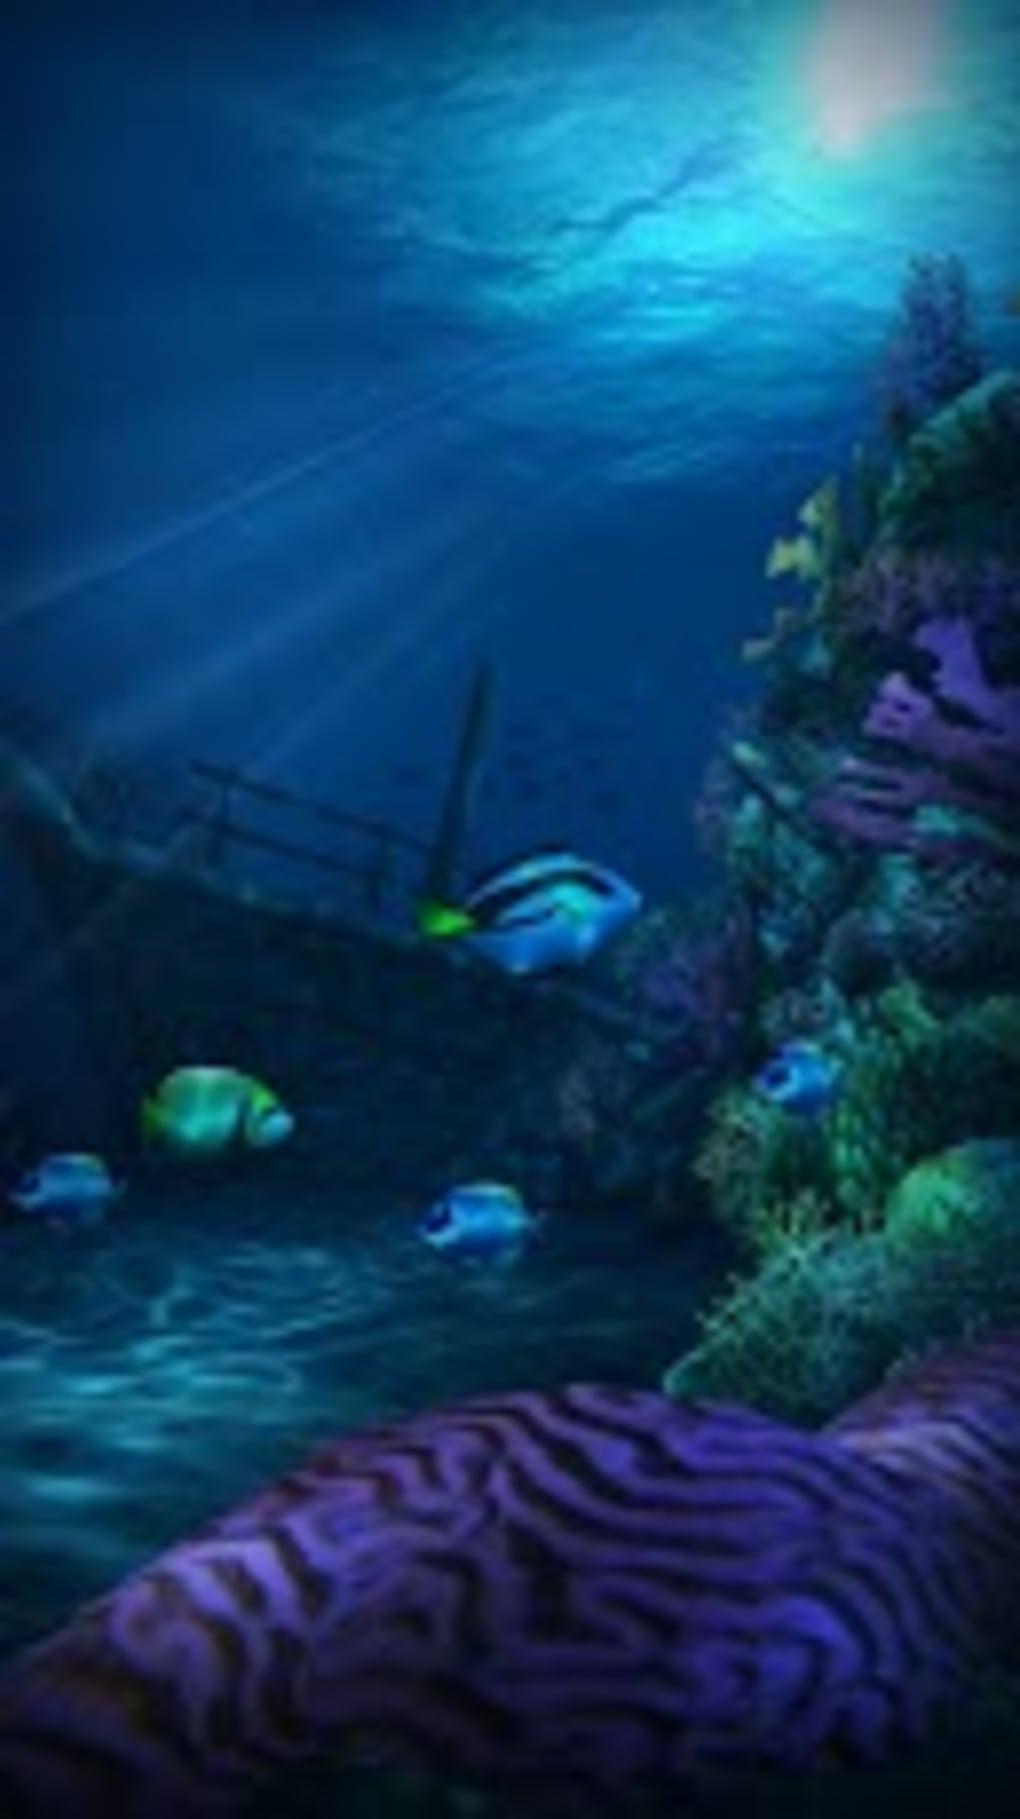 Ocean Hd Para Android - Descargar pour Bogi Wallpapers T?L?Chargement Libre